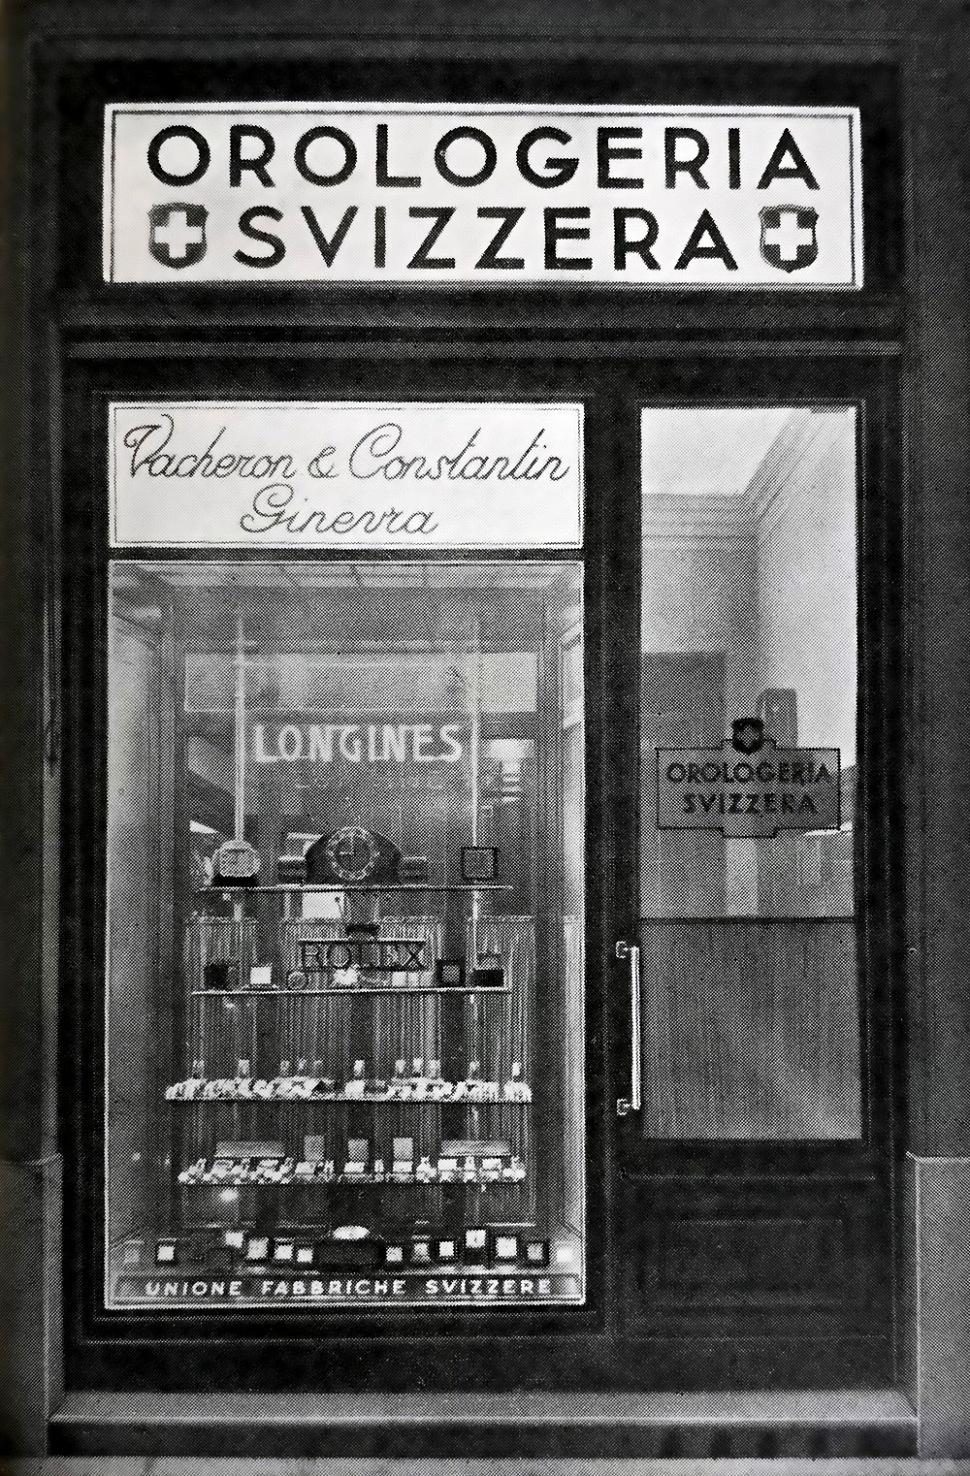 171001-orologeria-svizzera